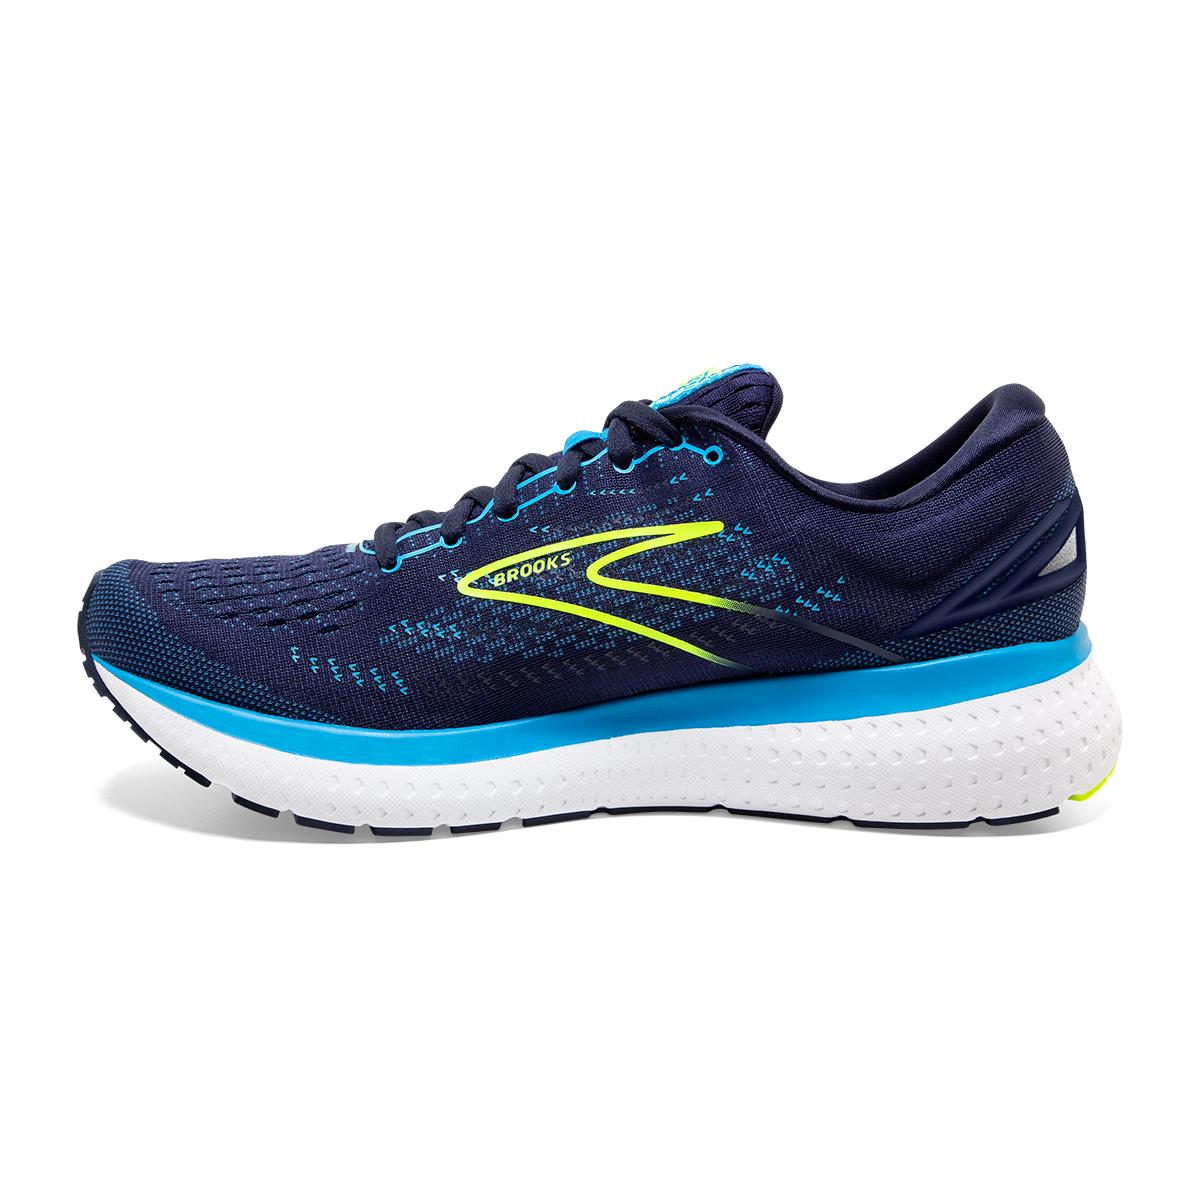 Men's Brooks Glycerin 19 Running Shoe - Color: Navy/Blue/Night - Size: 7 - Width: Regular, Navy/Blue/Night, large, image 5